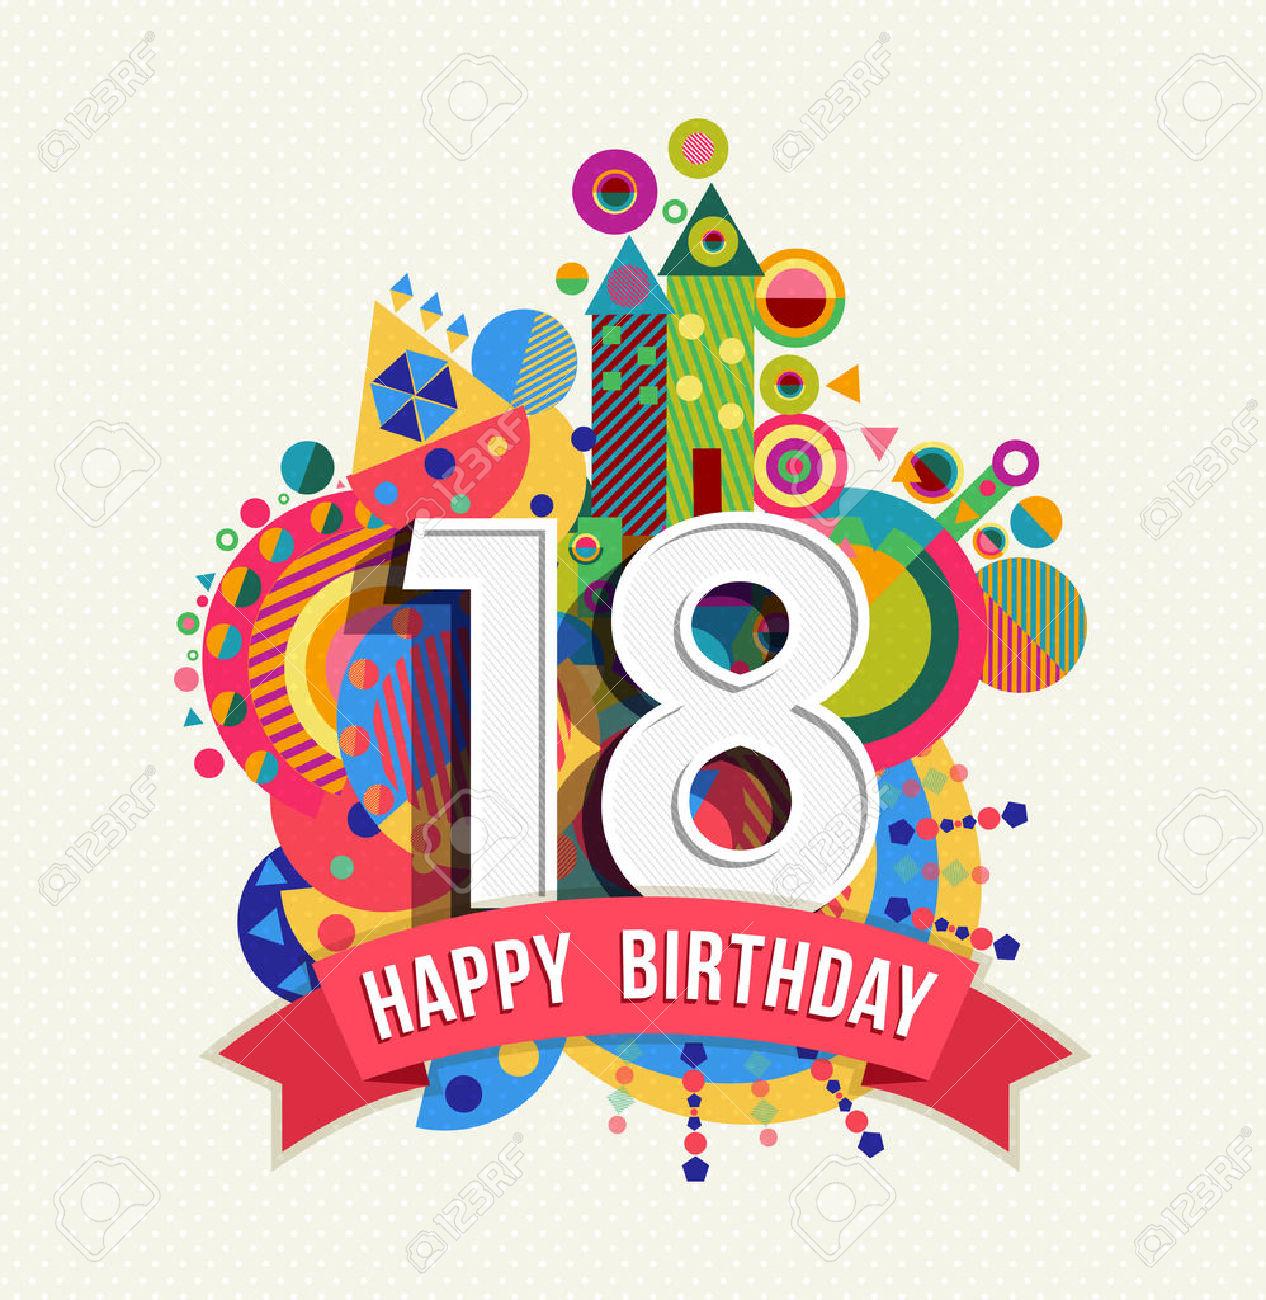 18 anni clipart jpg freeuse download 18 anni clipart - ClipartFest jpg freeuse download